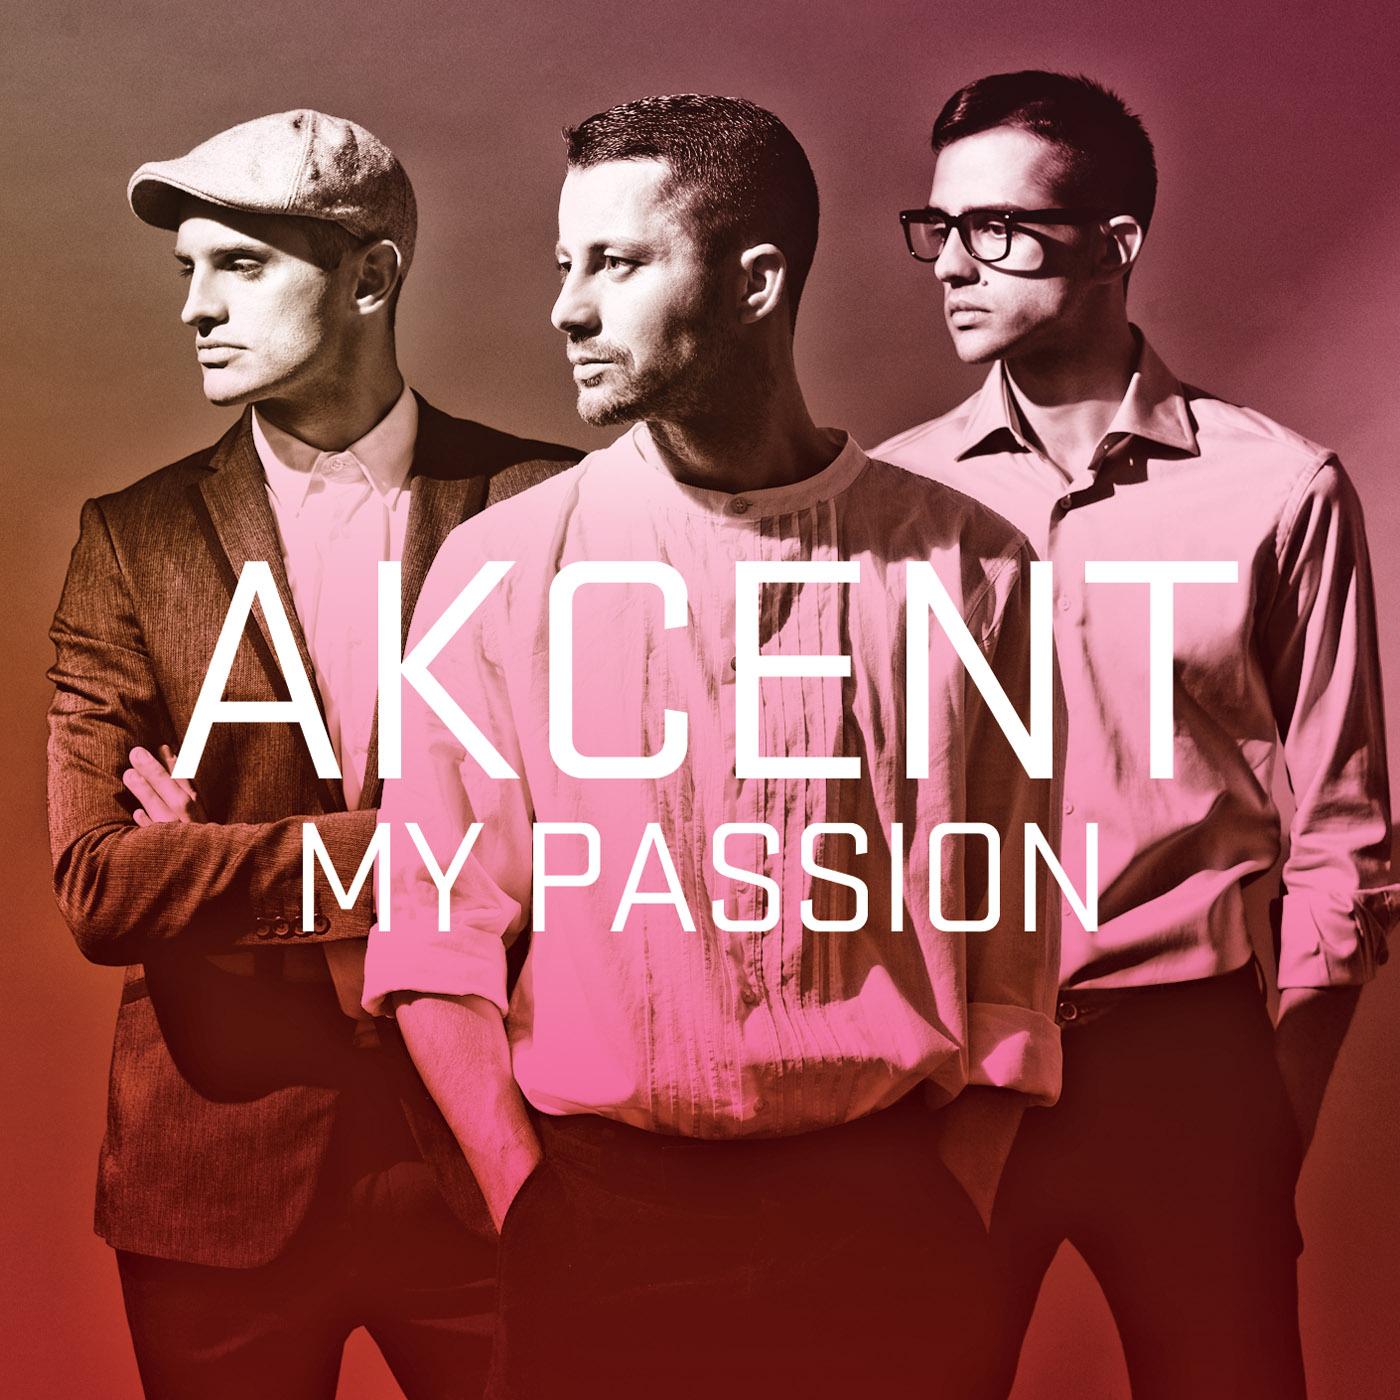 40. Akcent - My Passion.jpg